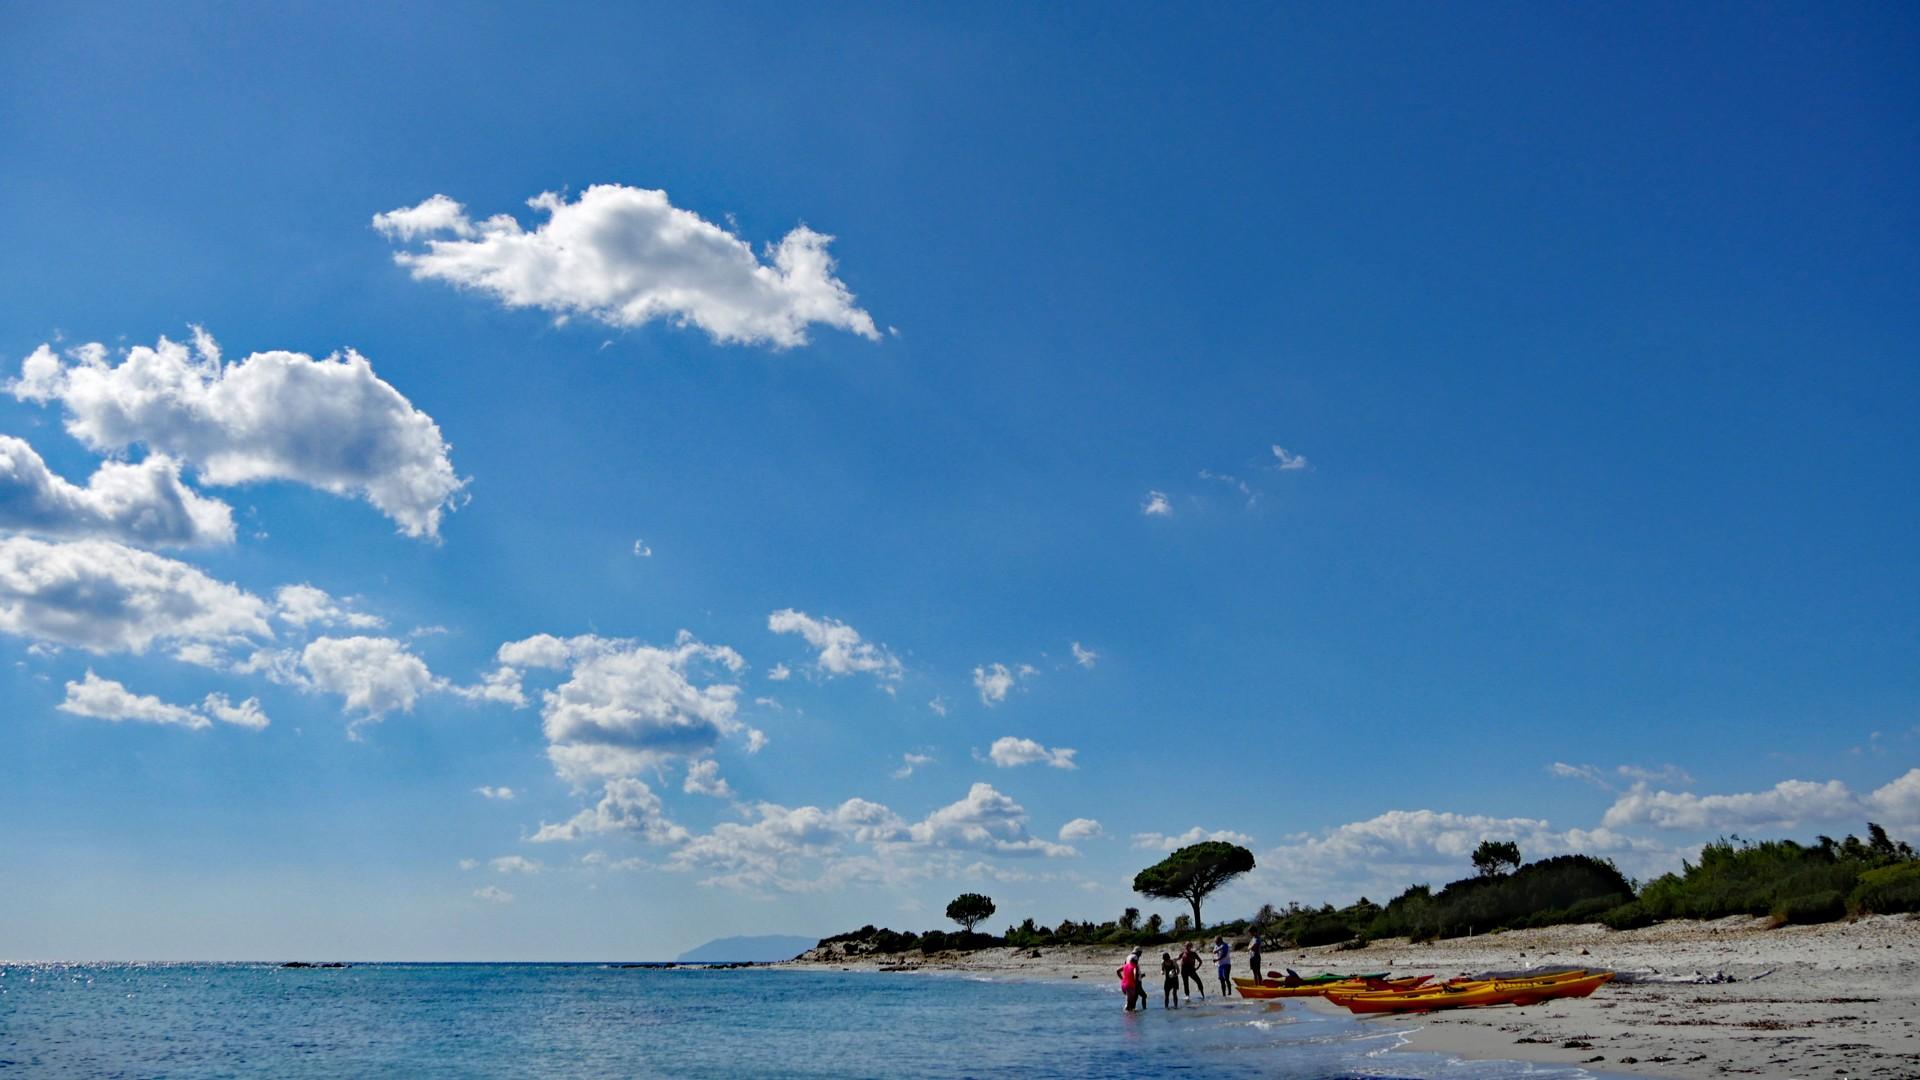 Spiaggia di Berchida - kayakers and a big sky view.jpg - Sardinia - Wilderness Blue Sea Kayaking - Kayaking